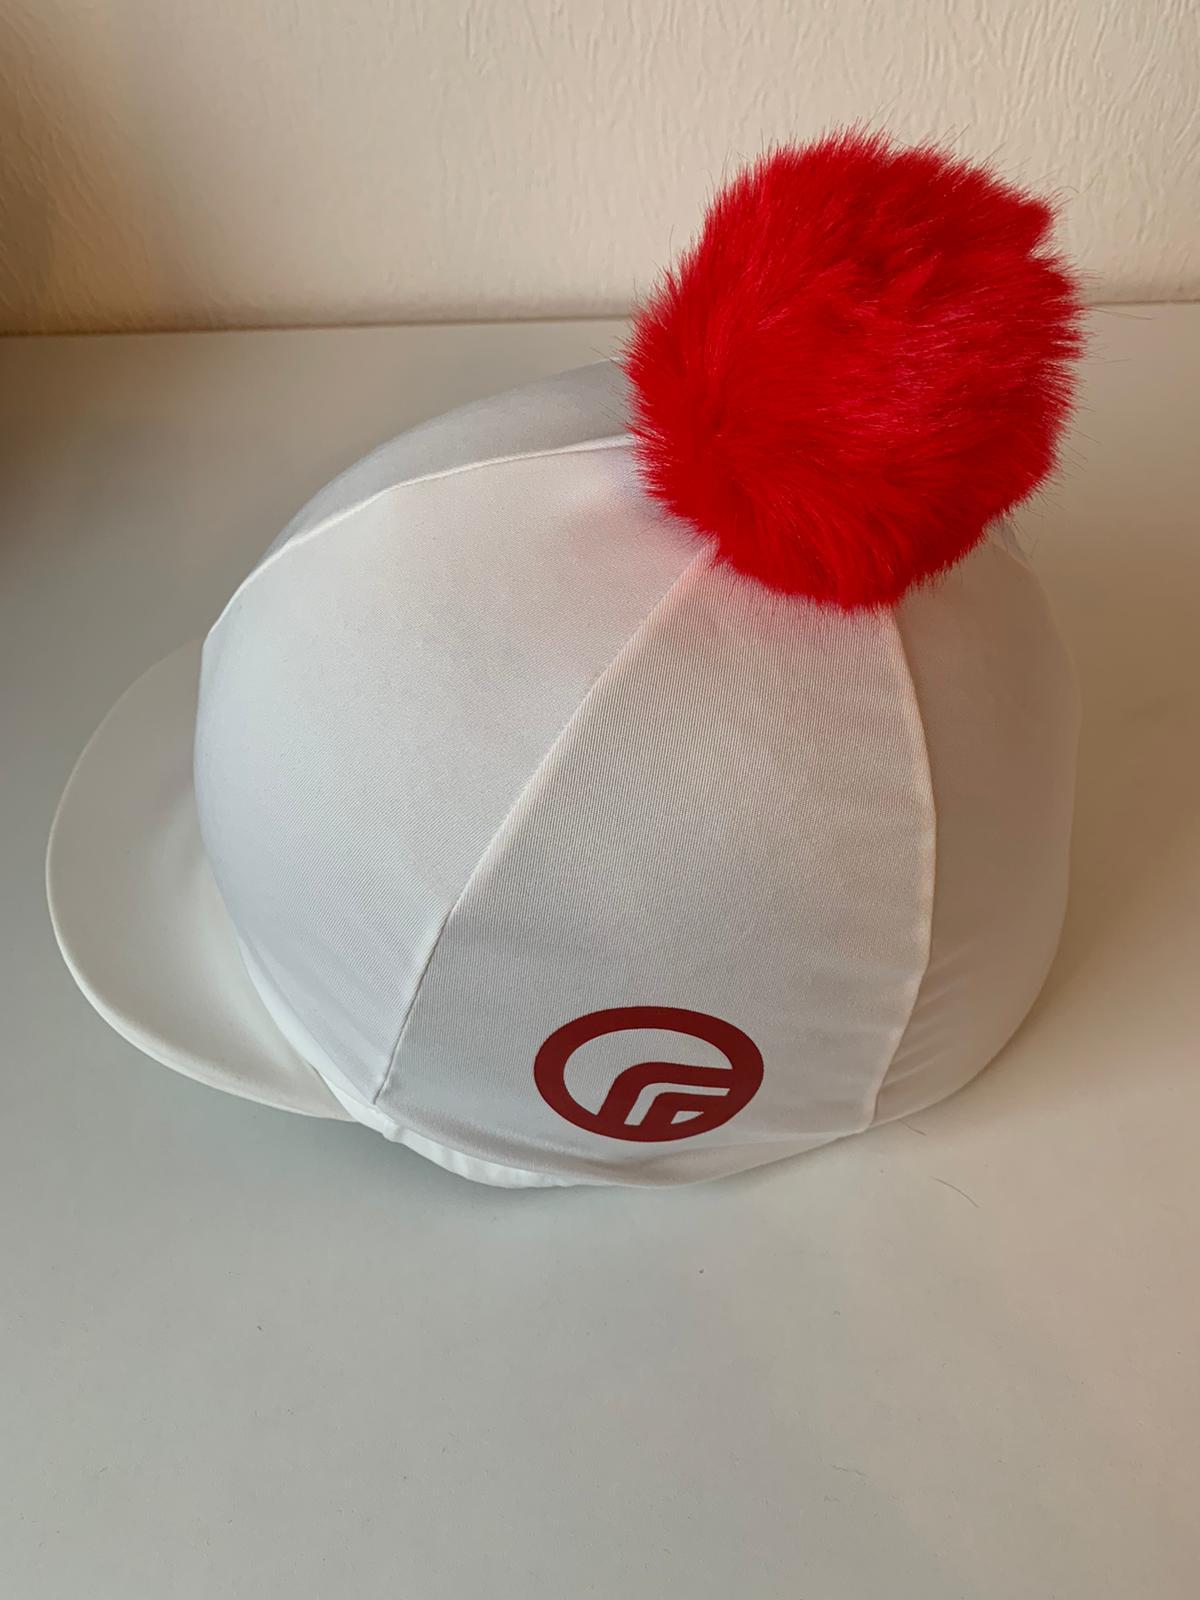 https://www.fomoprotection.com/wp-content/uploads/2019/10/Hat-Silk-Riding-Hat.jpg